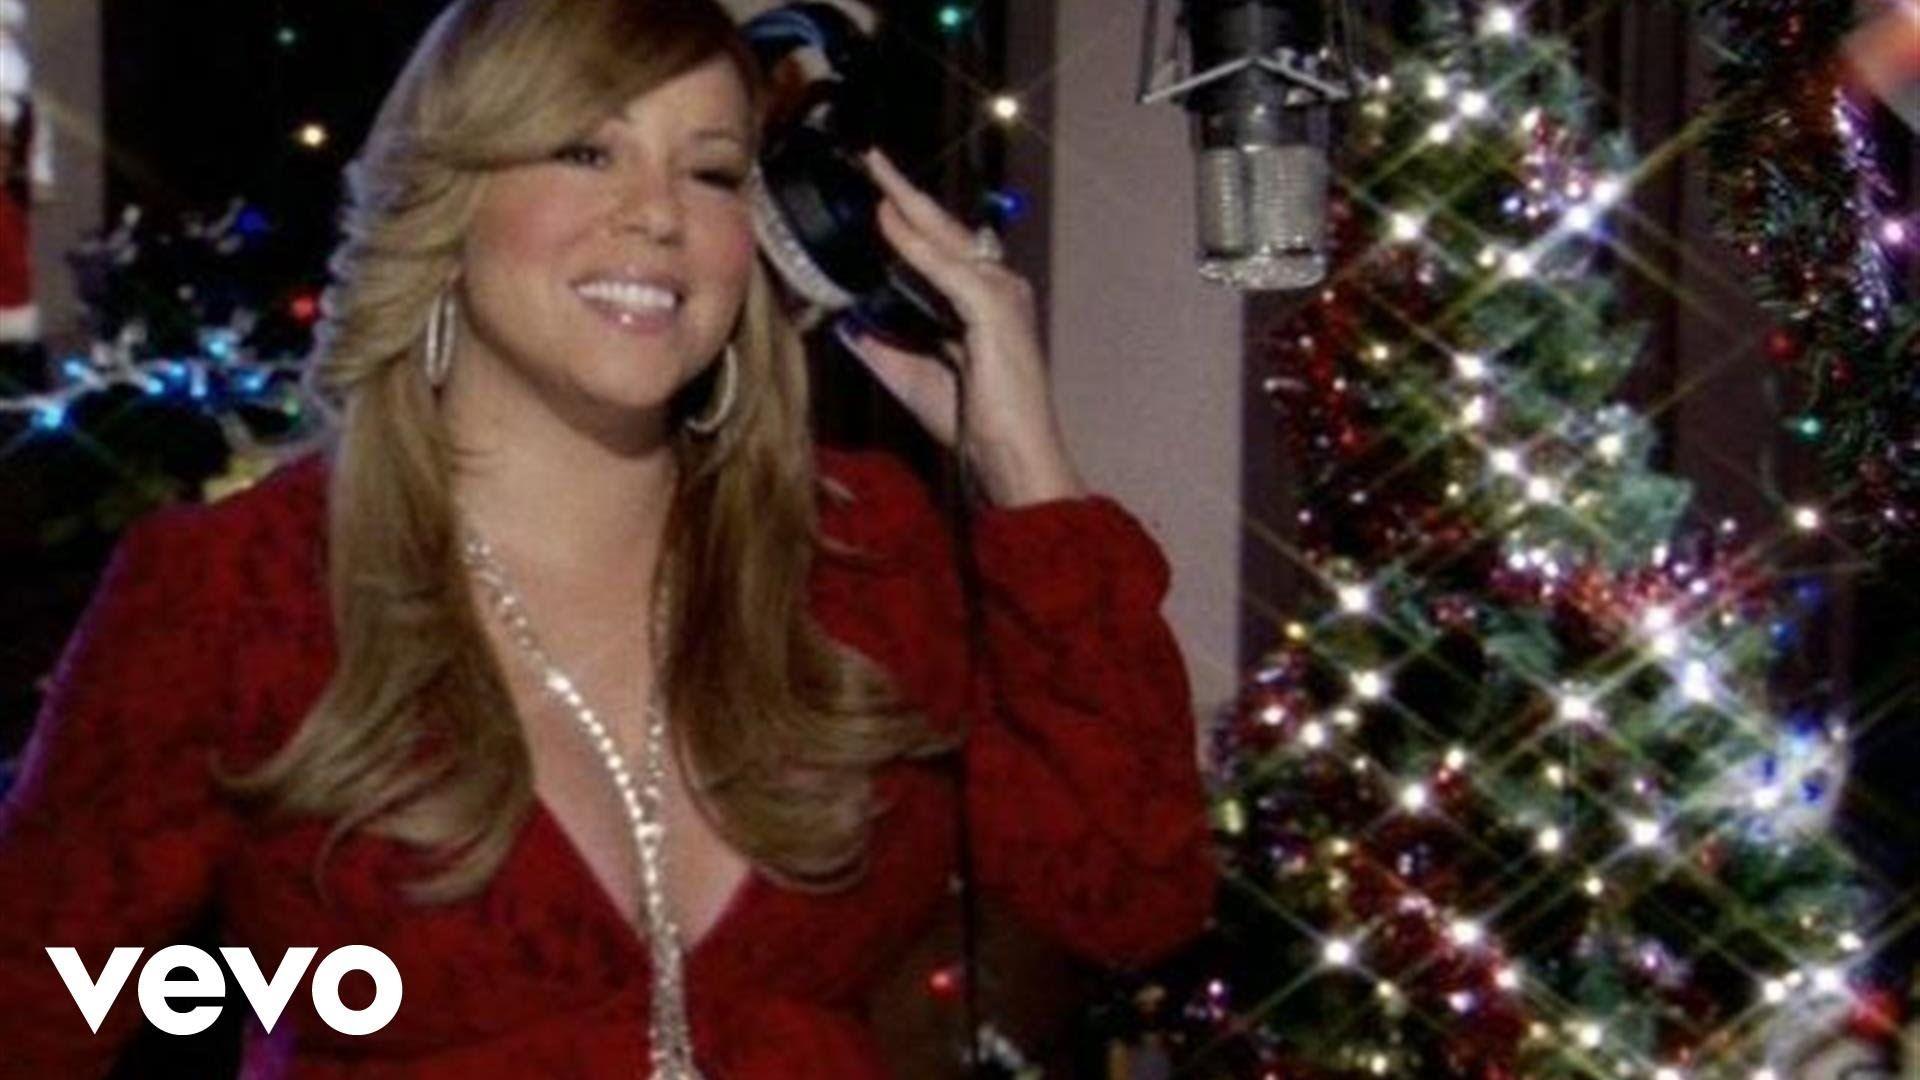 Mariah Carey O Come All Ye Faithful/Hallelujah Chorus ft